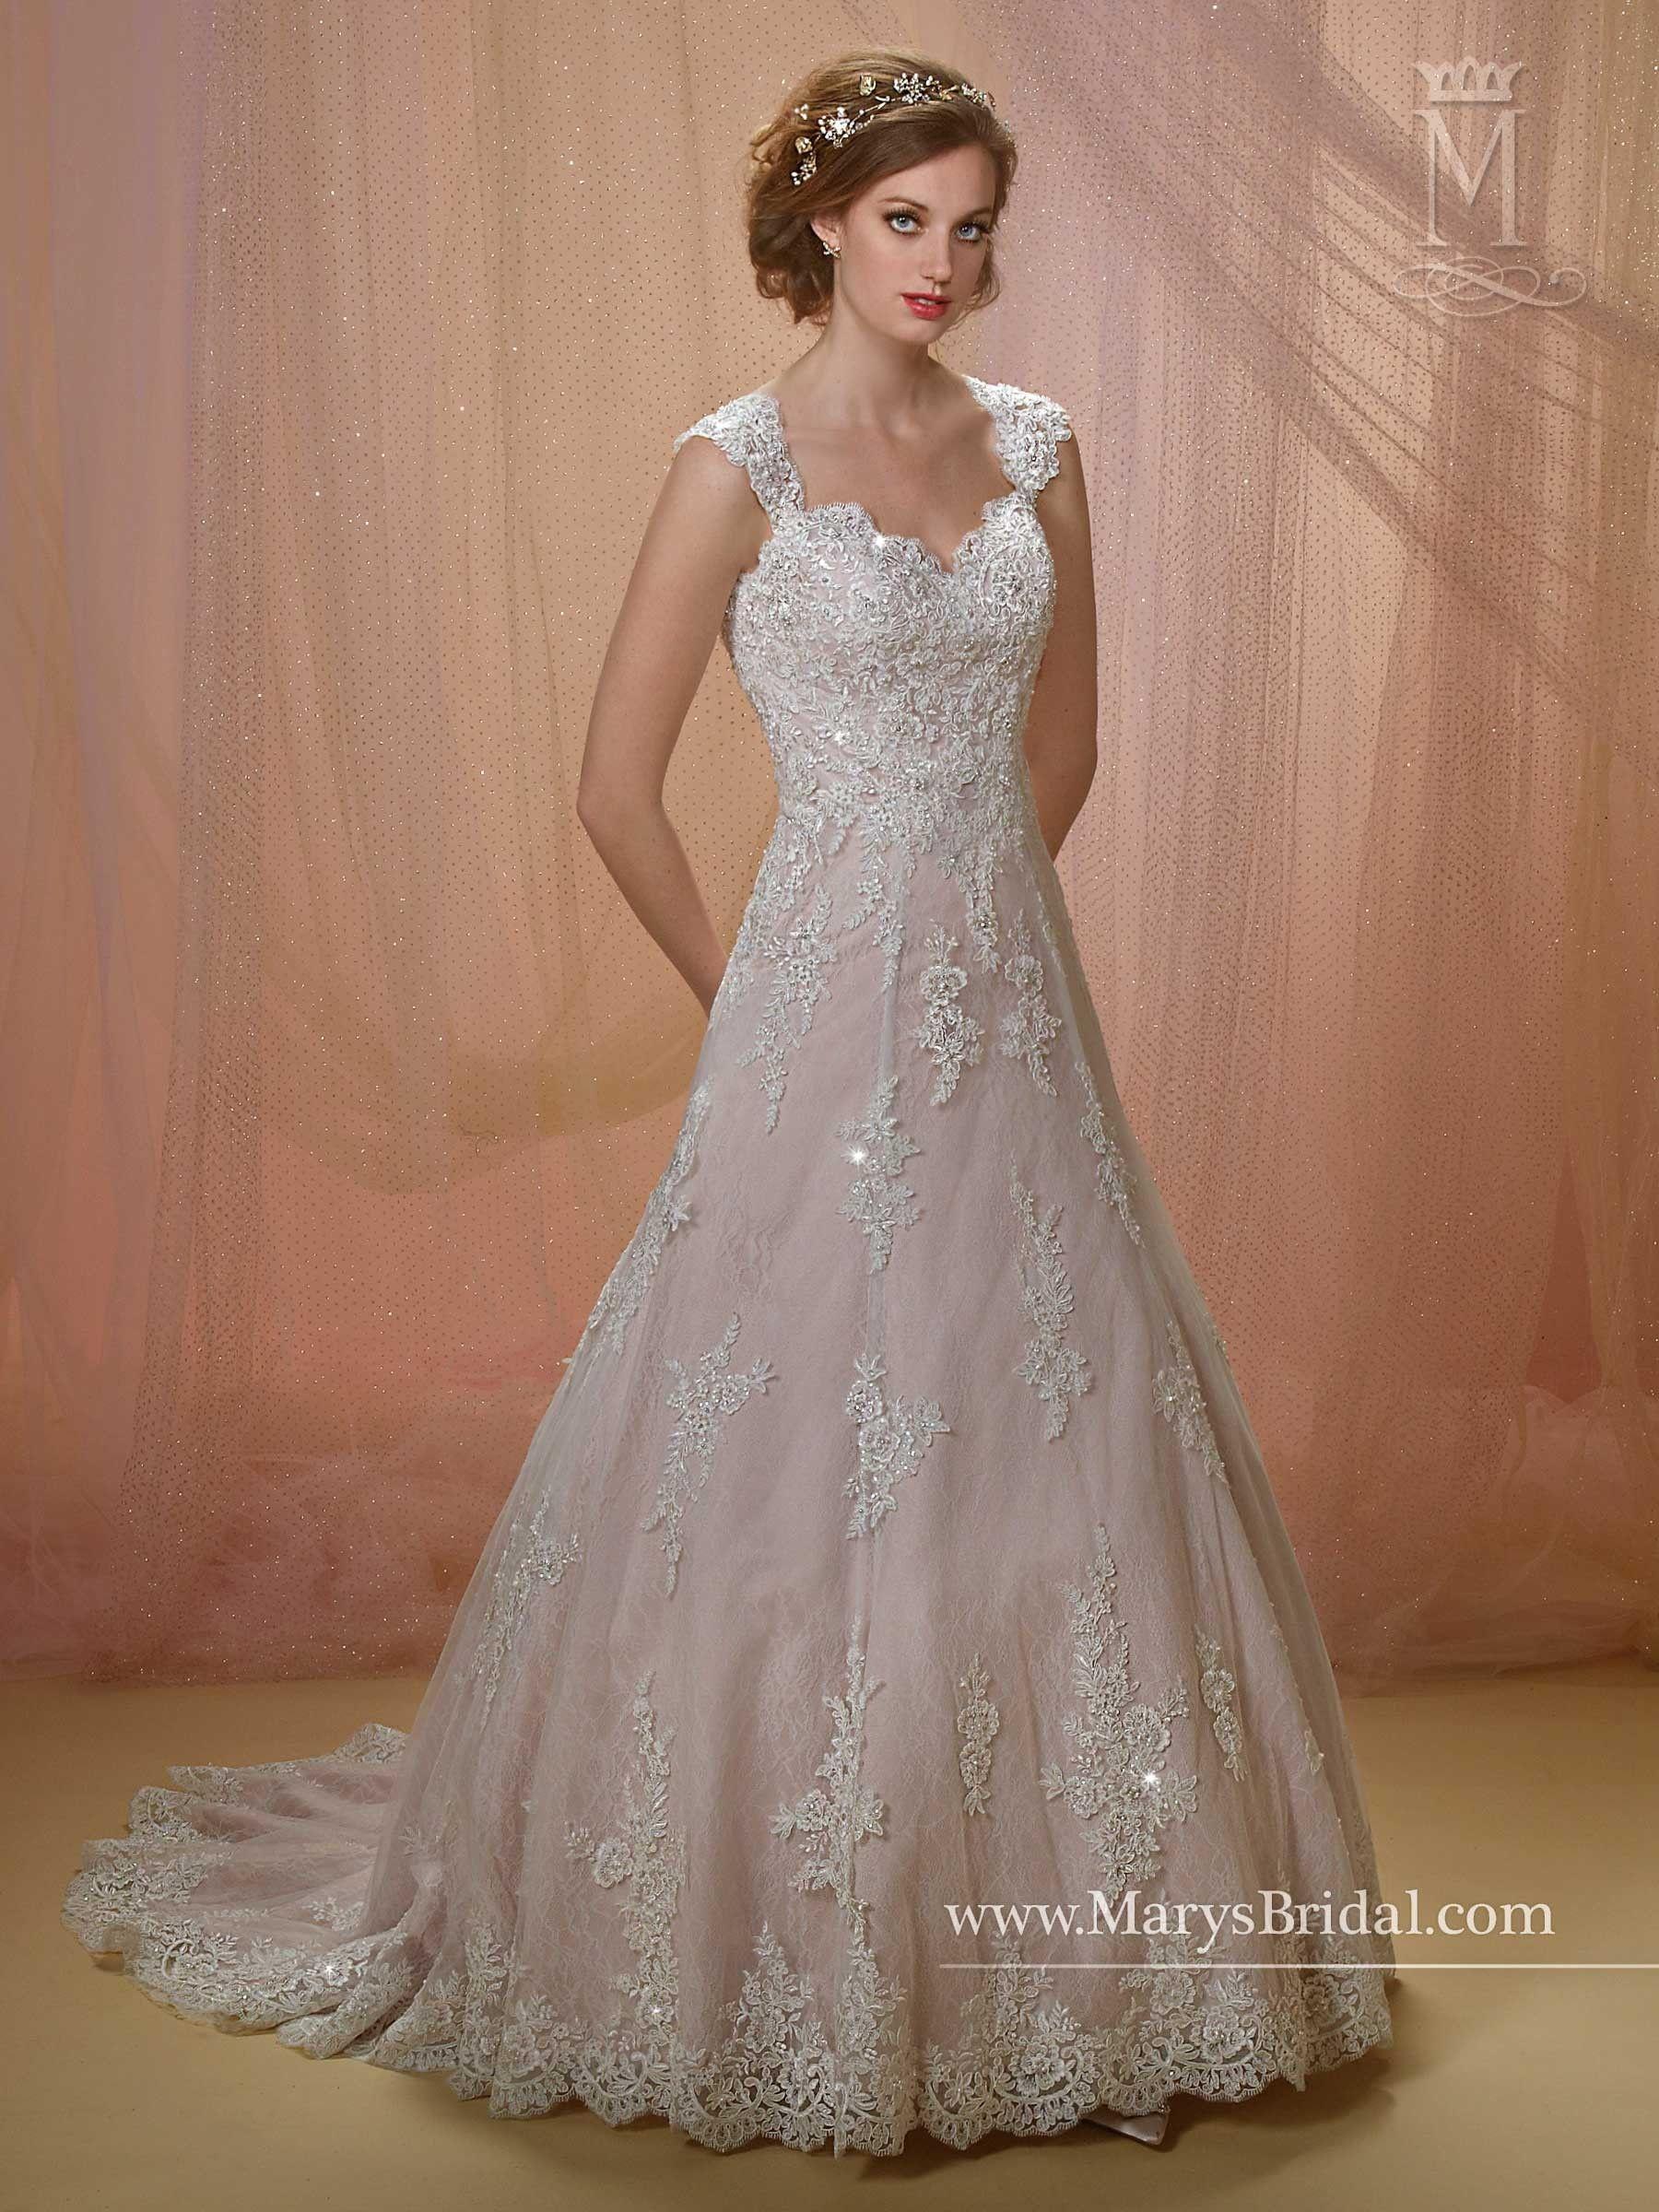 Marys Bridal Style F16 6512 858 00 Wedding Best Pricesfashion Dressdress